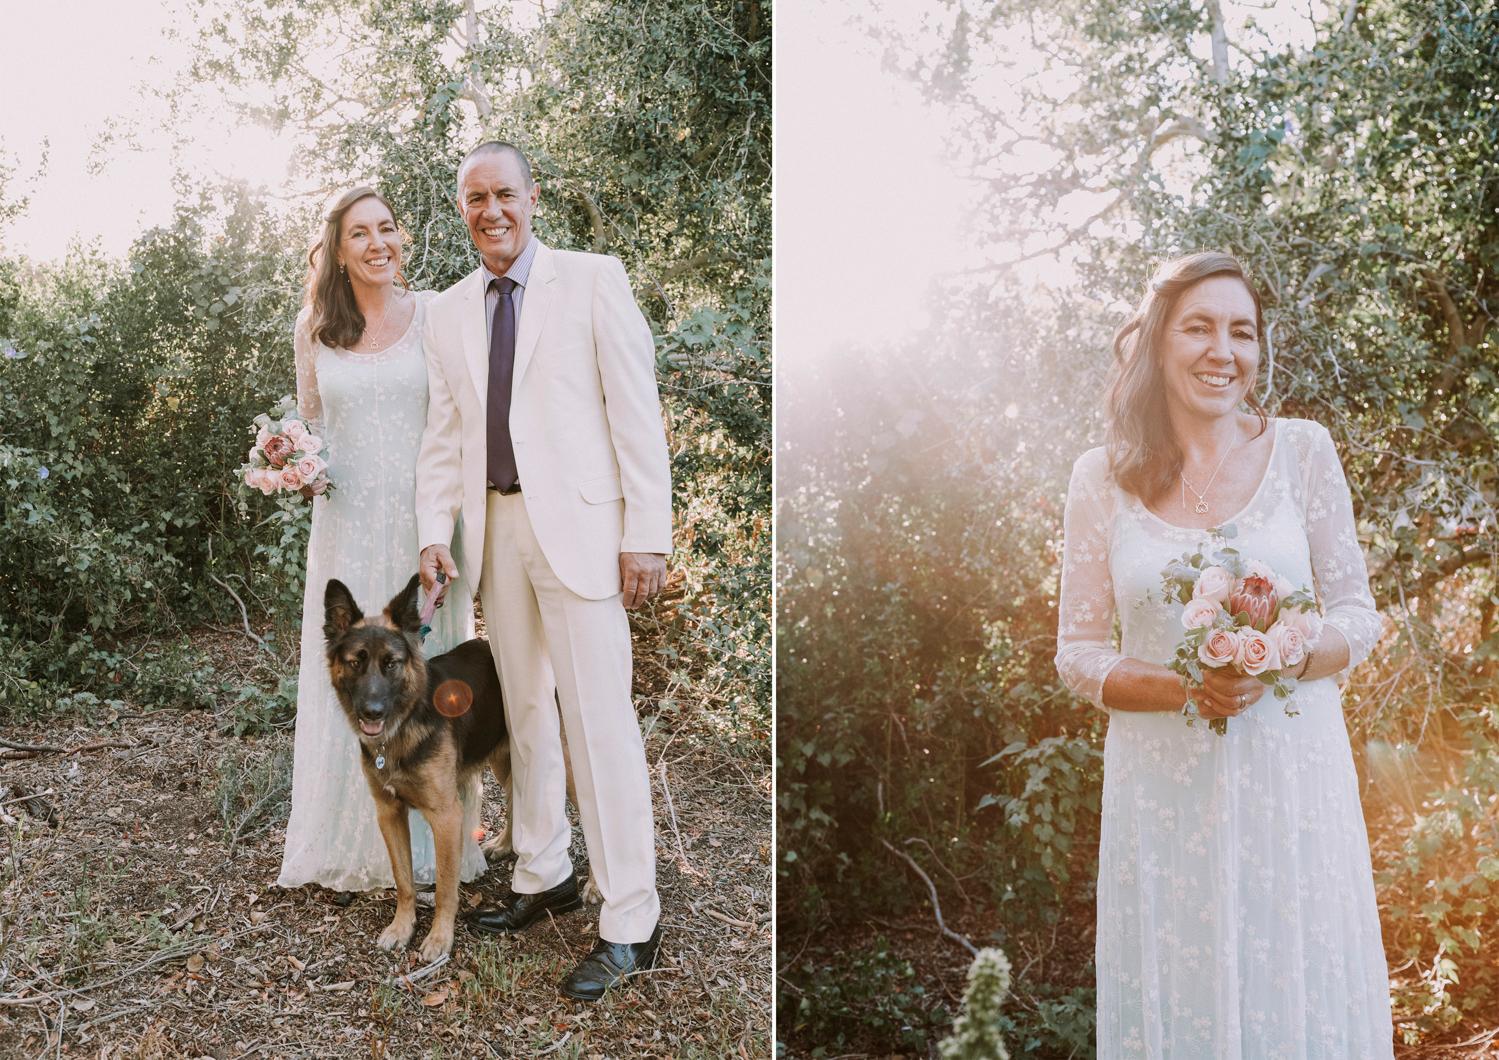 cape town wedding photographer - bianca asher-16.jpg